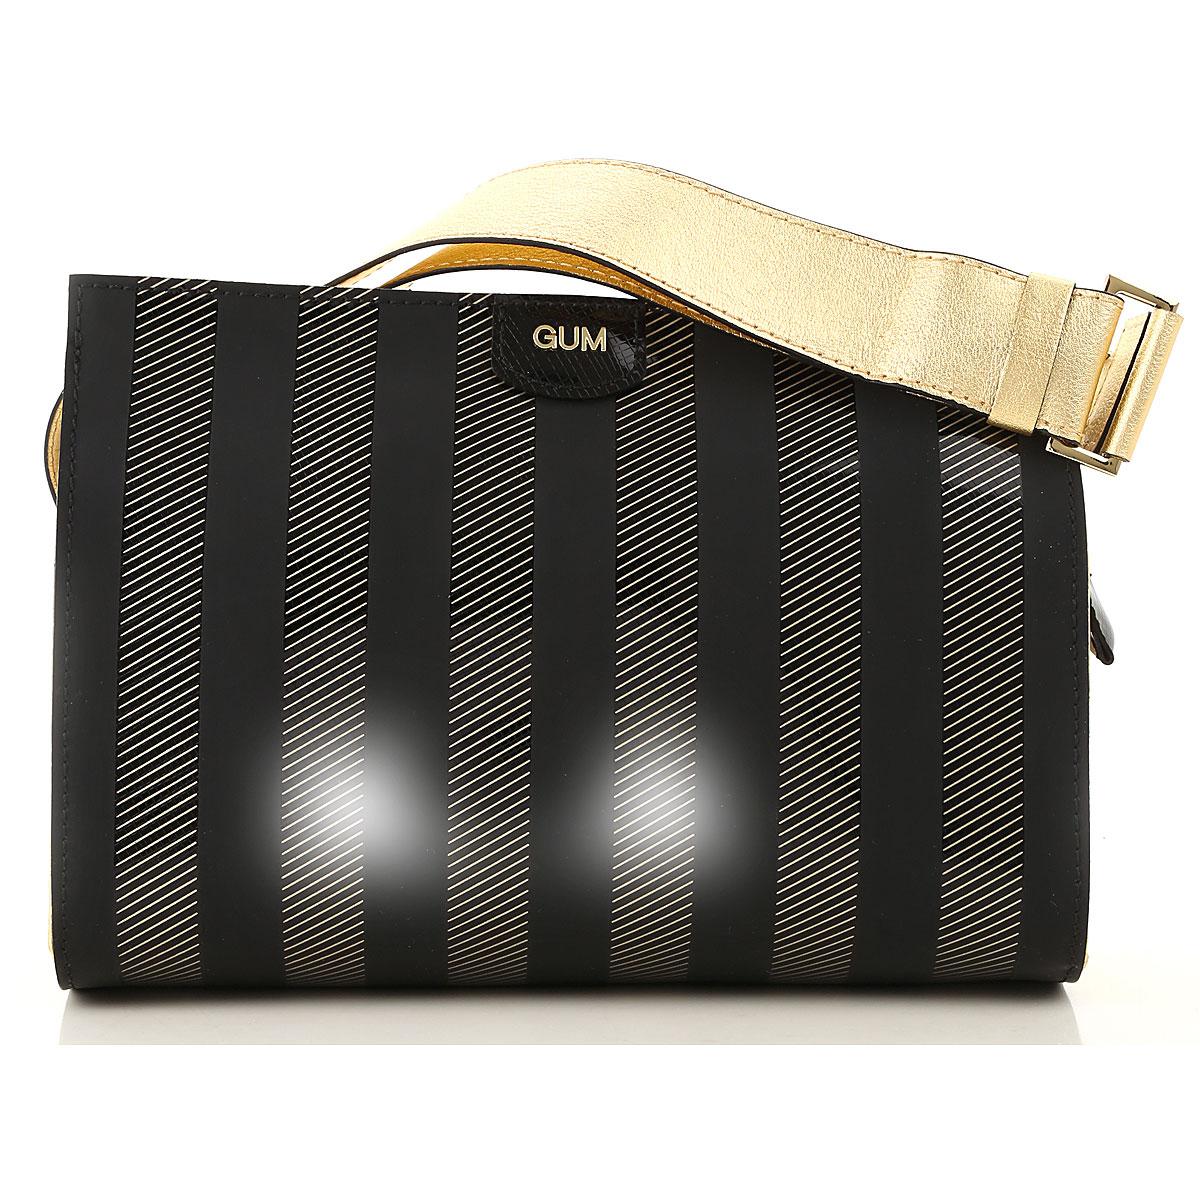 GUM Gianni Chiarini Design Shoulder Bag for Women On Sale, Black, Vynil, 2019